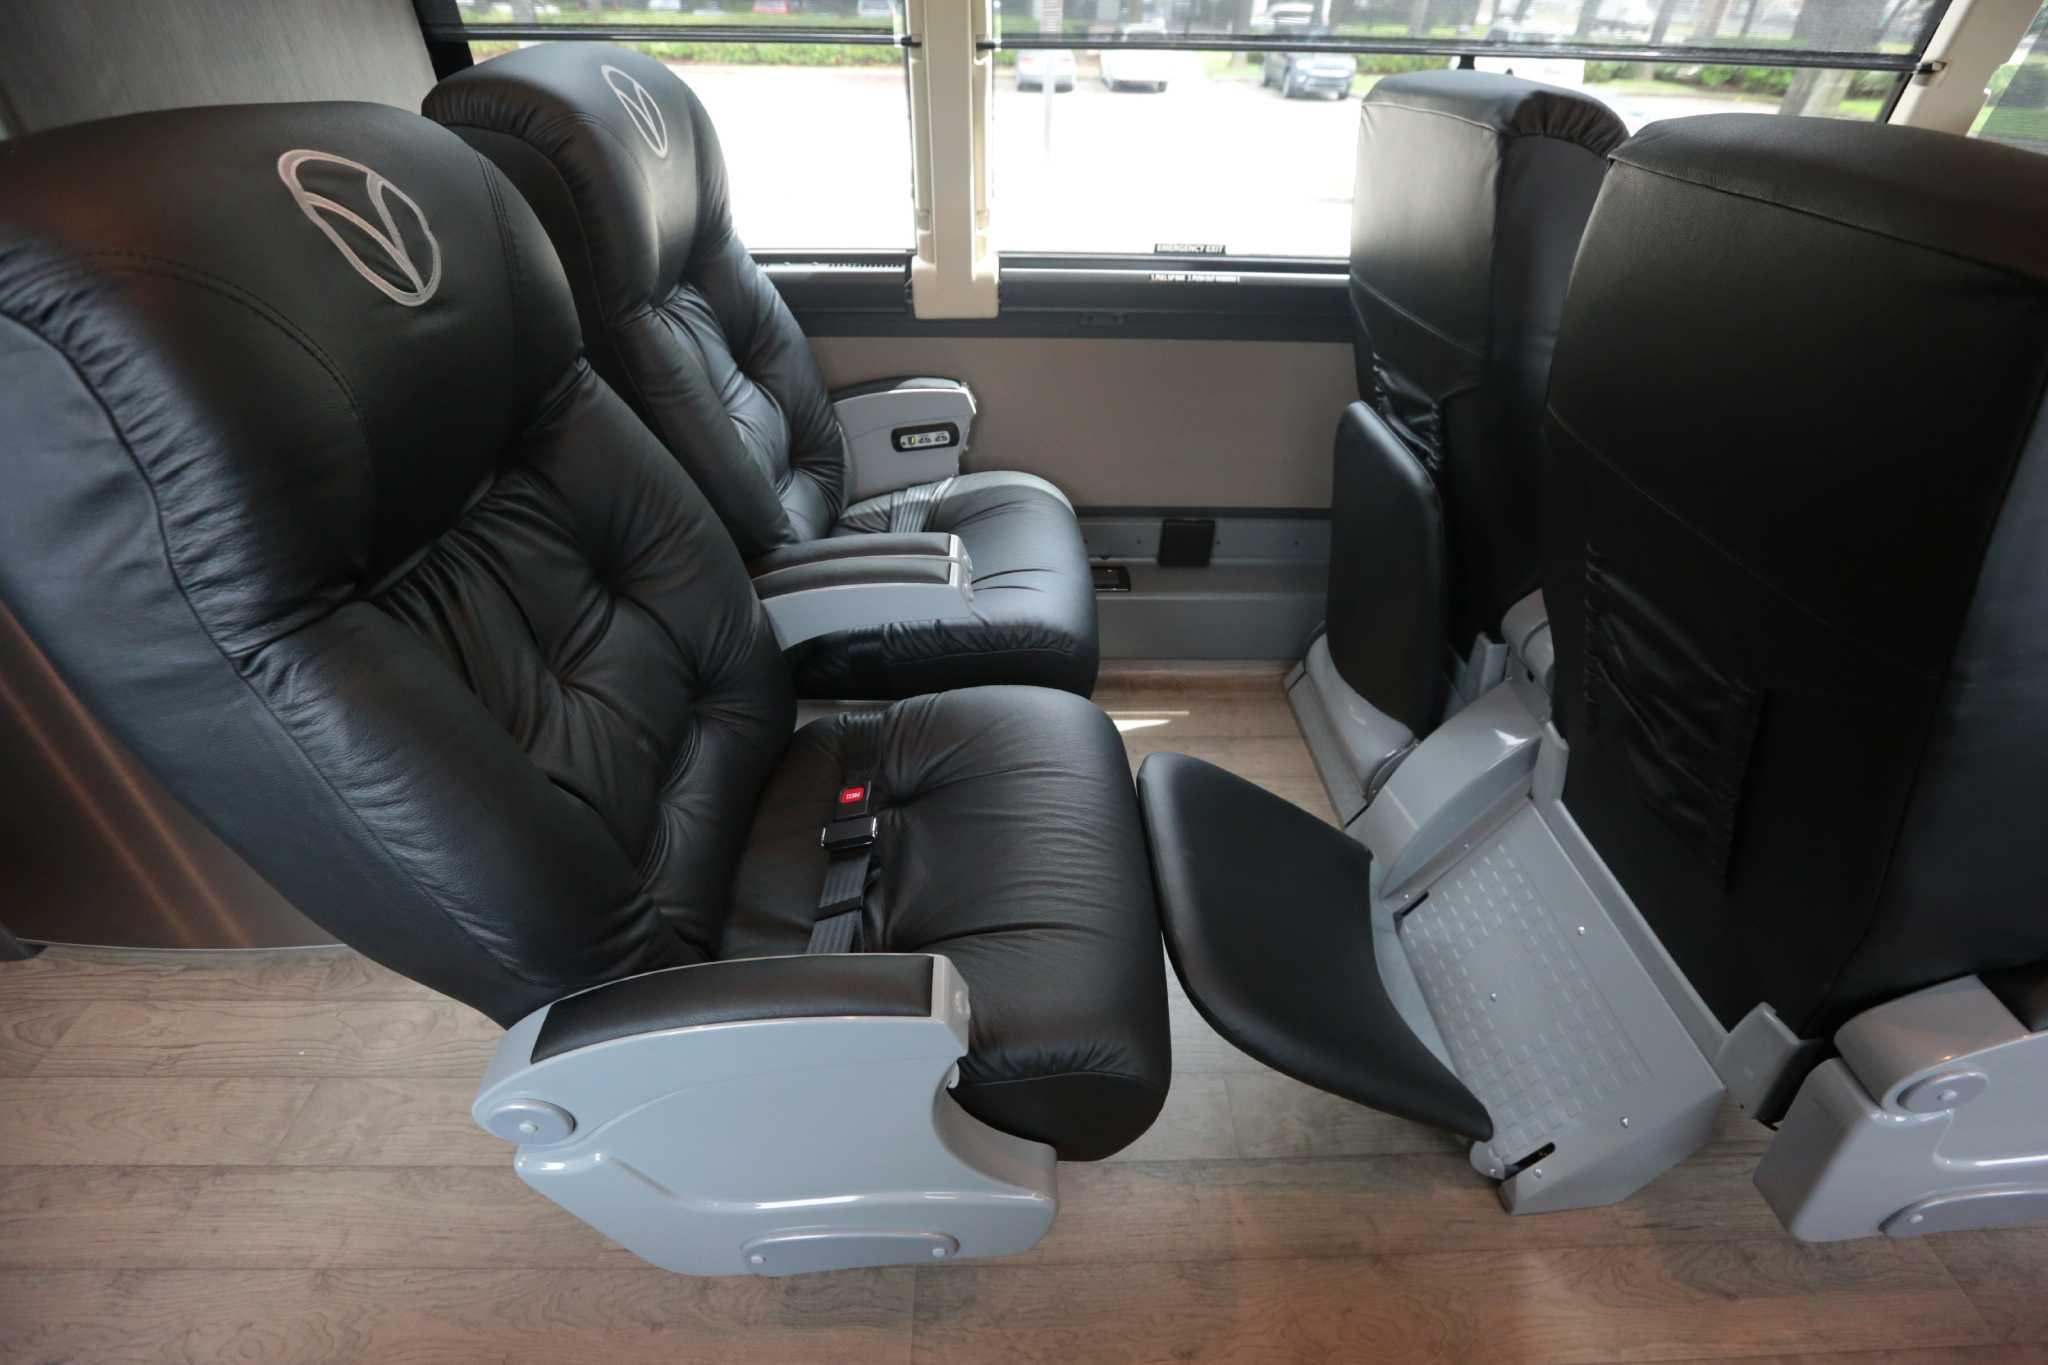 Luxury Bus Service Aims To Meet Growing Houston Dallas Travel Demand Houstonchronicle Com